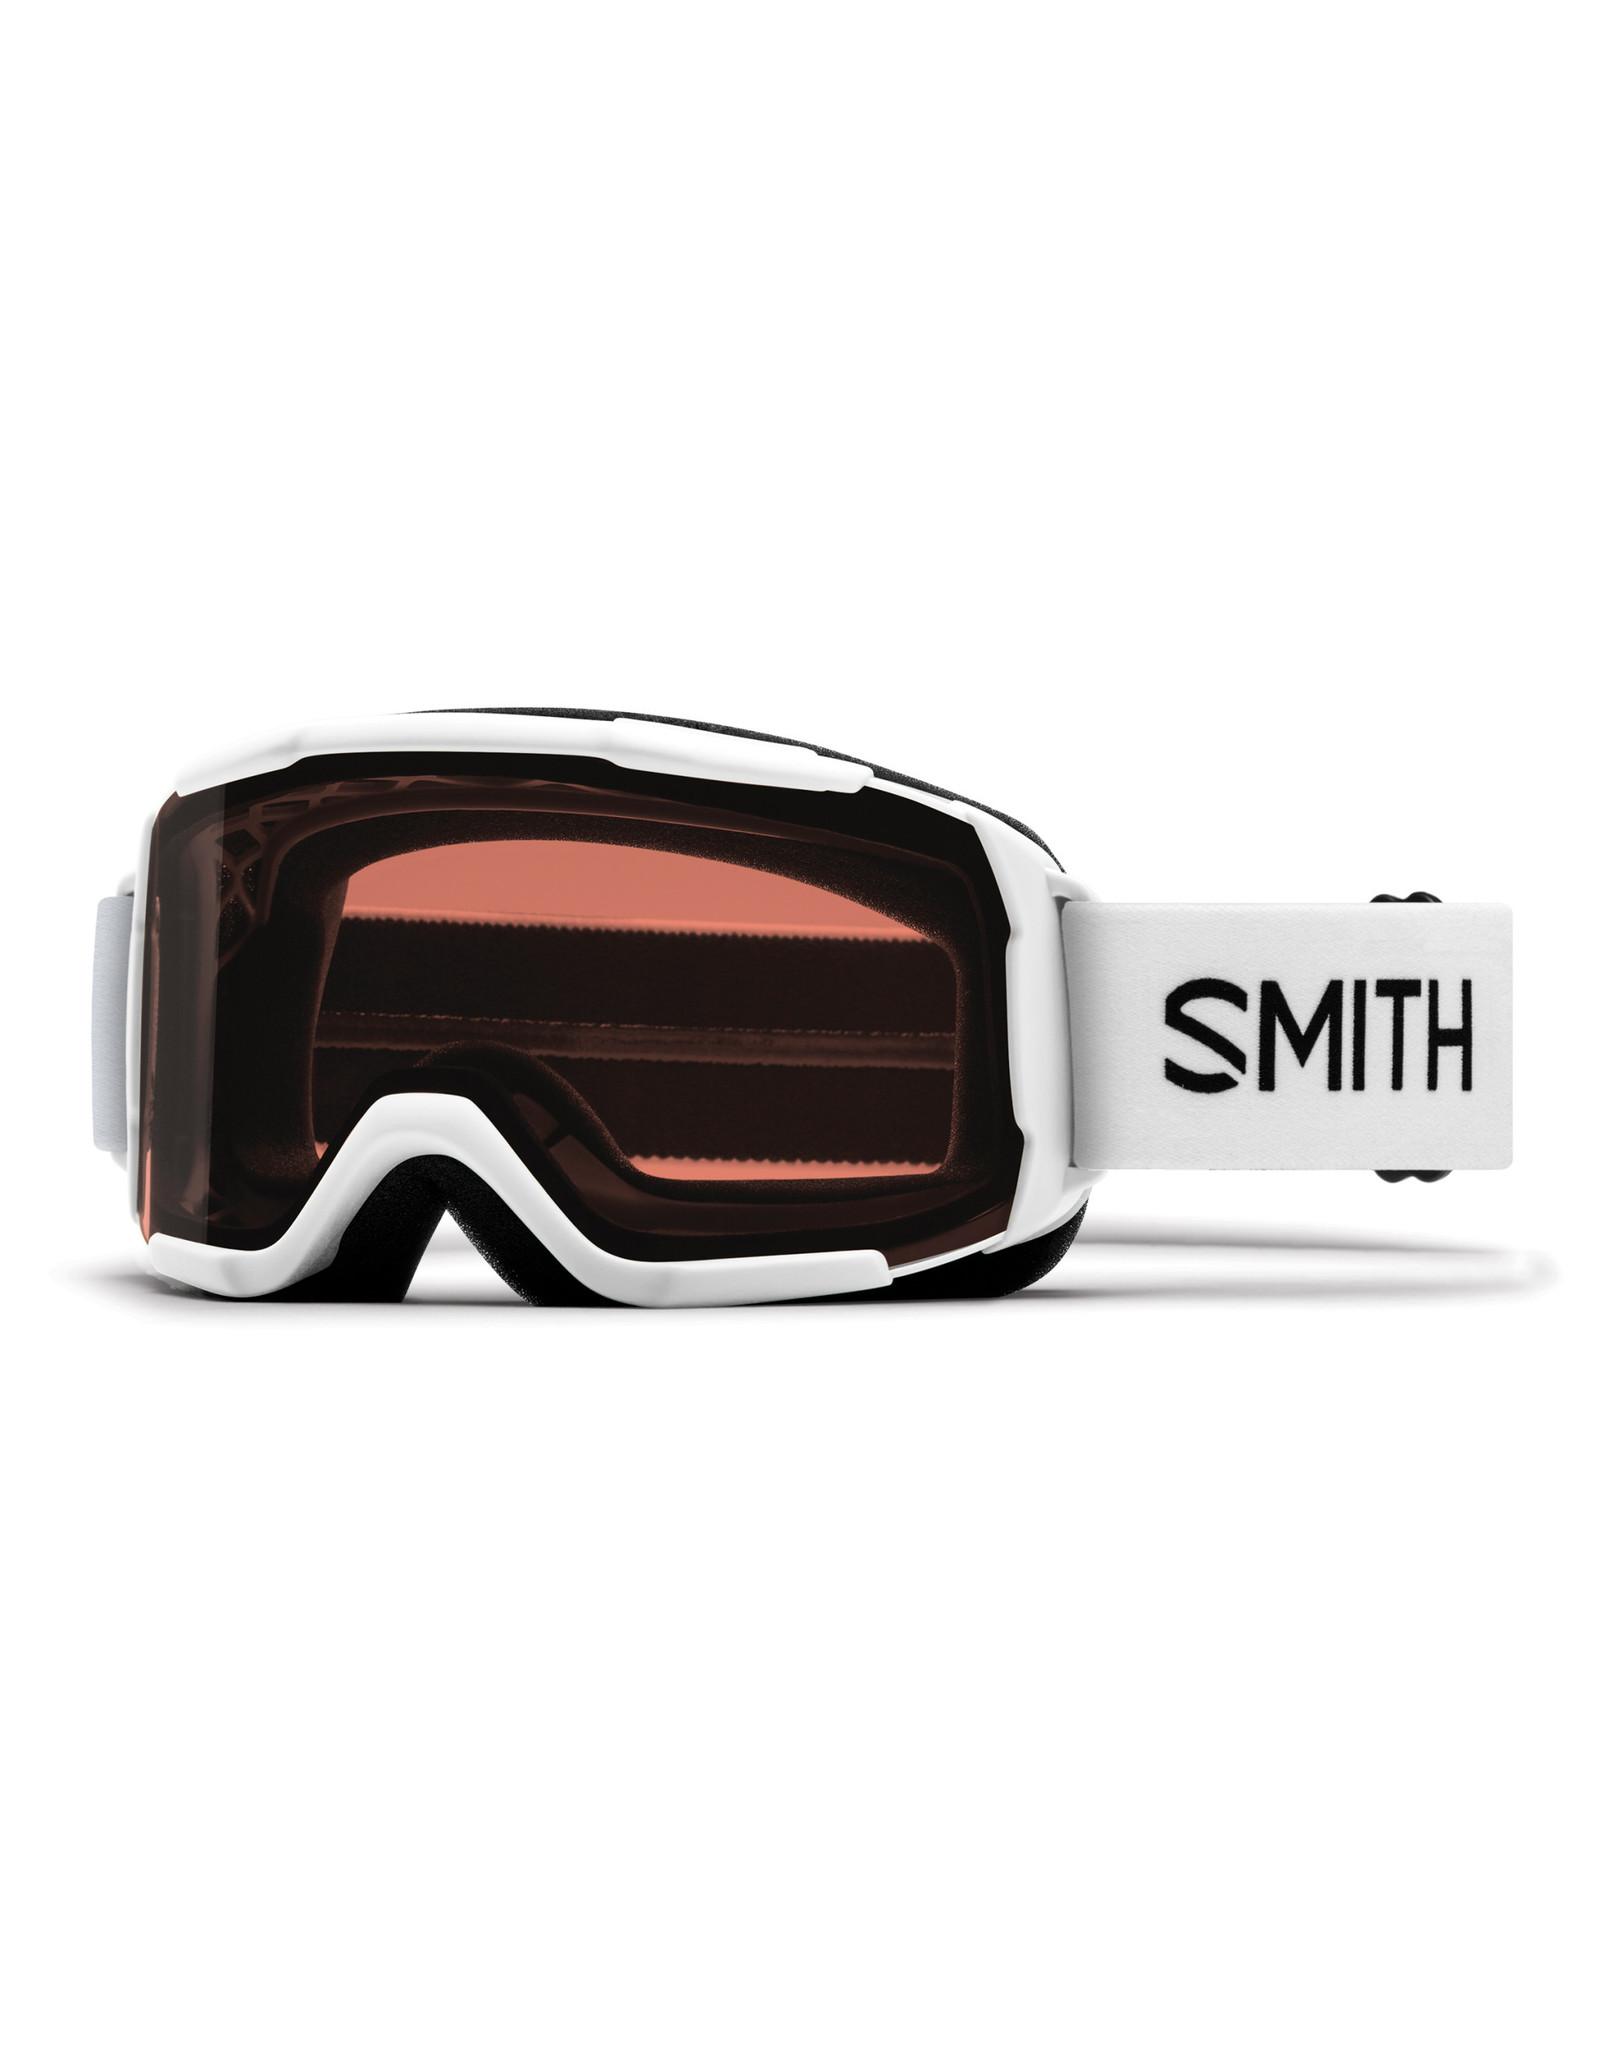 Smith SMITH DAREDEVIL WHITE 20 SKI GOGGLE YOUTH